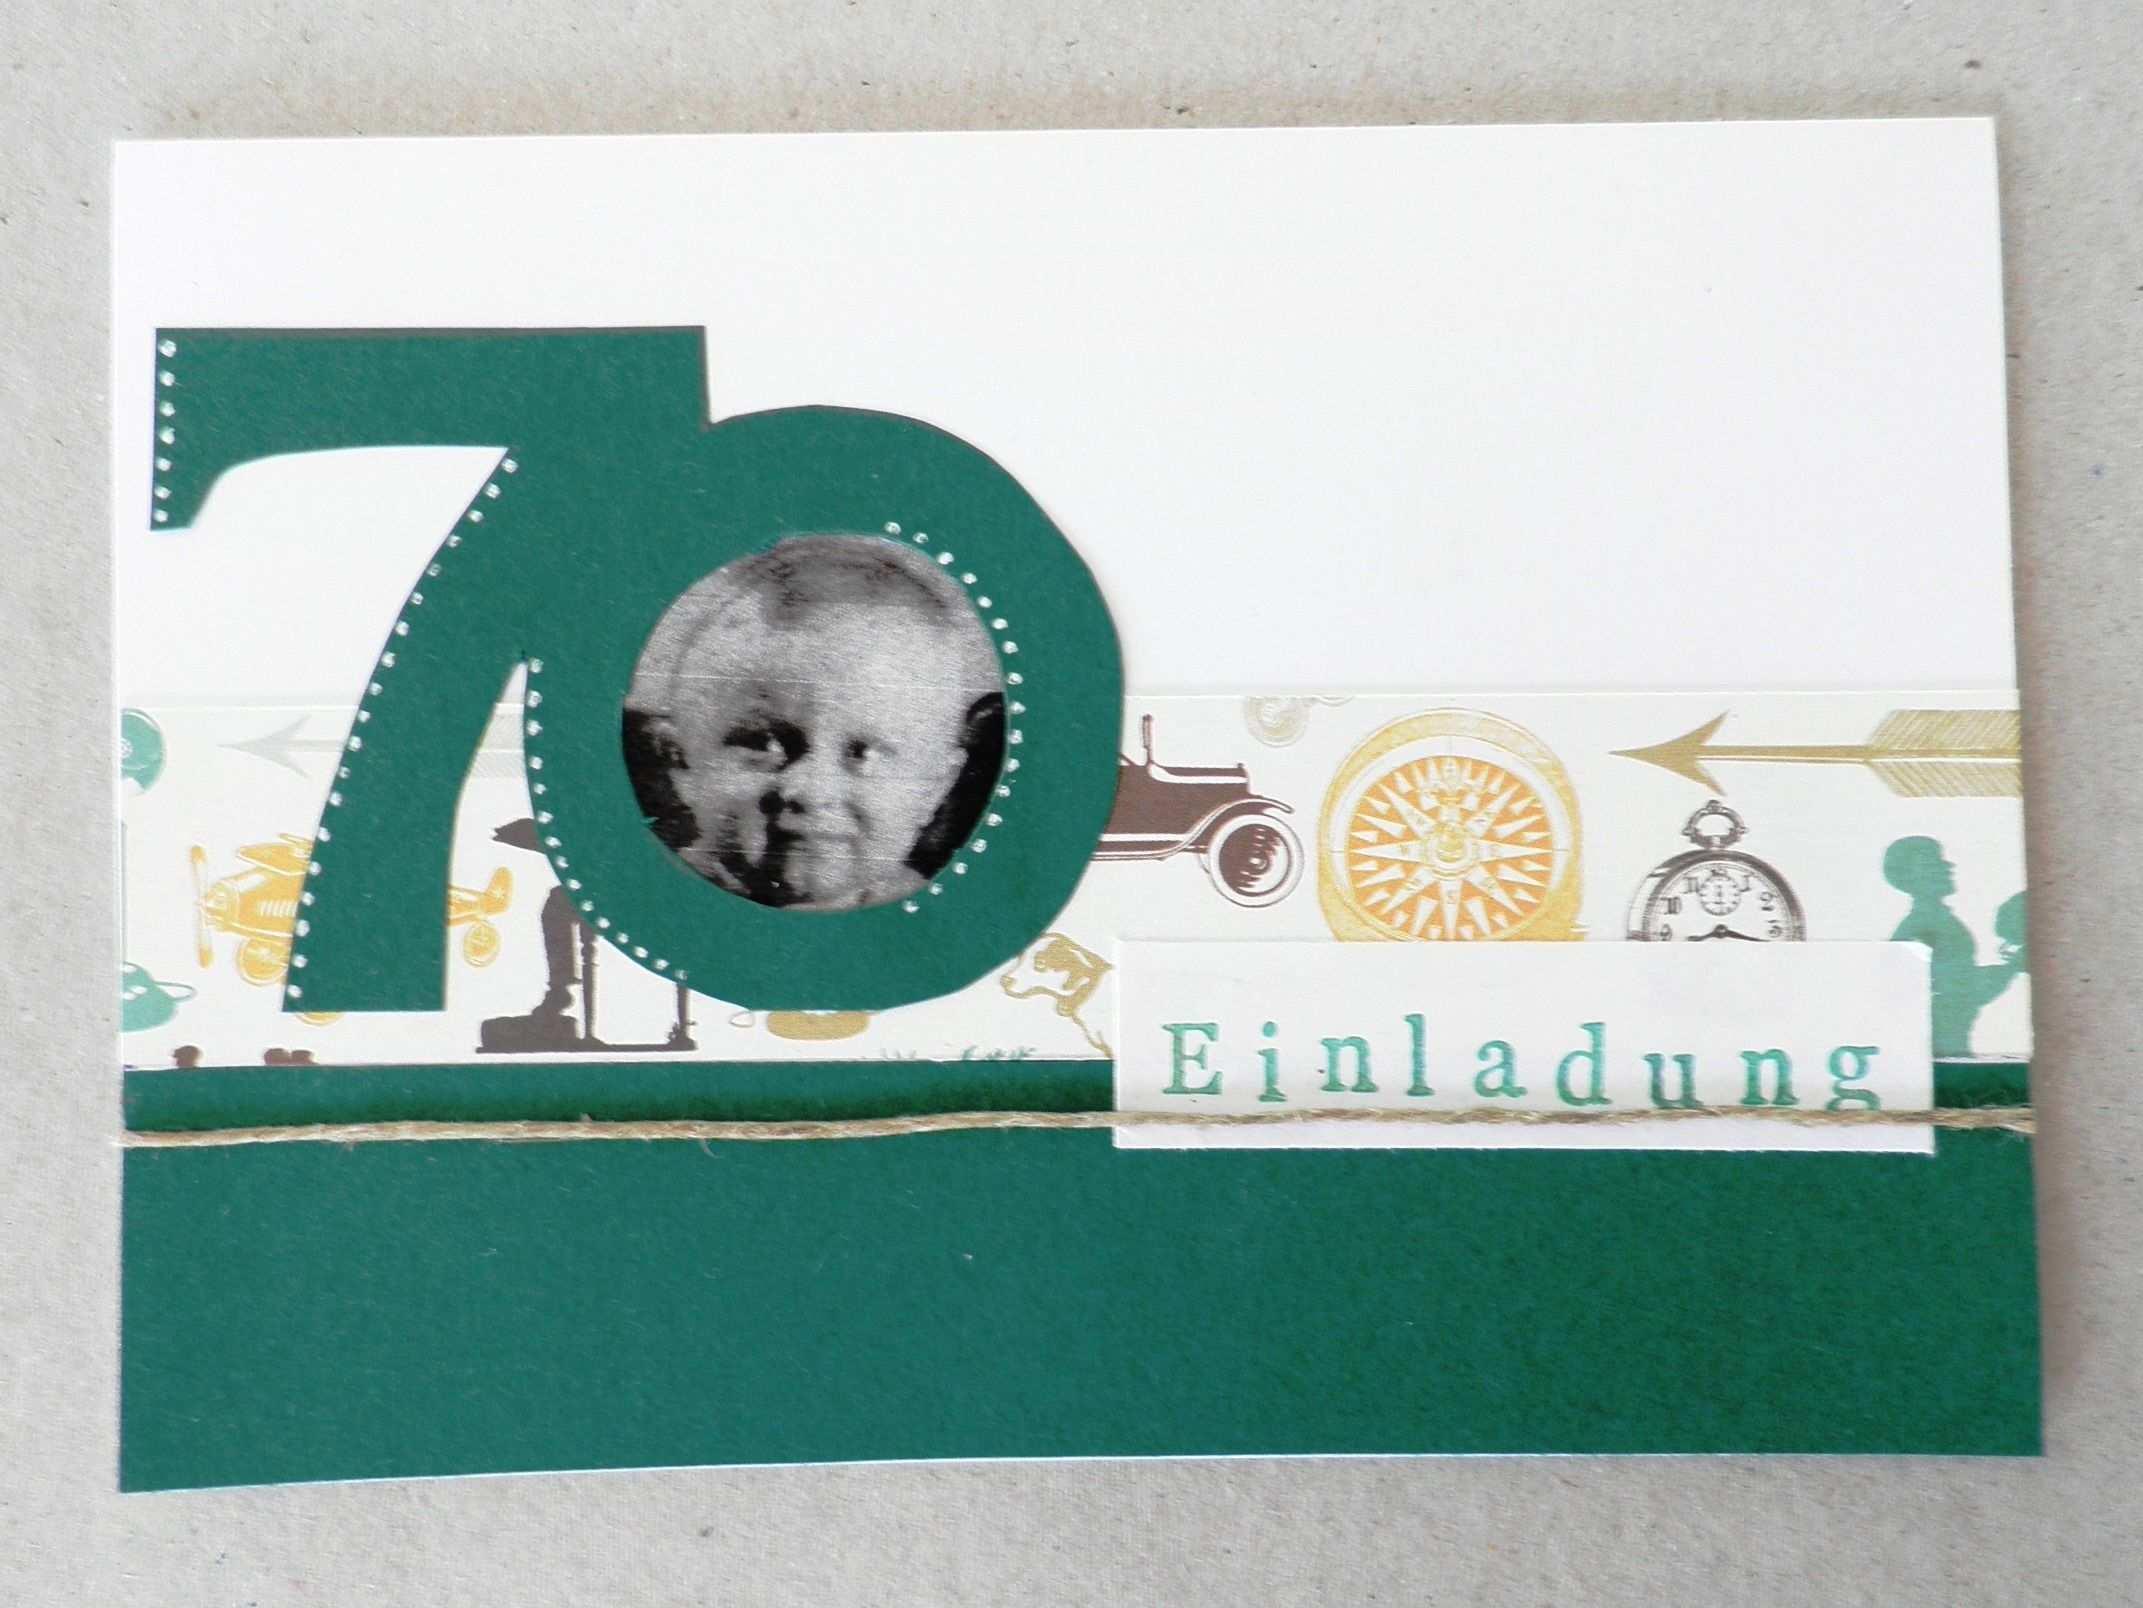 Einladung 70 Geburtstag Einladung 70 Geburtstag Vorlage Kostenlos Geburstag E Einladung 70 Geburtstag Einladung Geburtstag Einladungskarten 70 Geburtstag